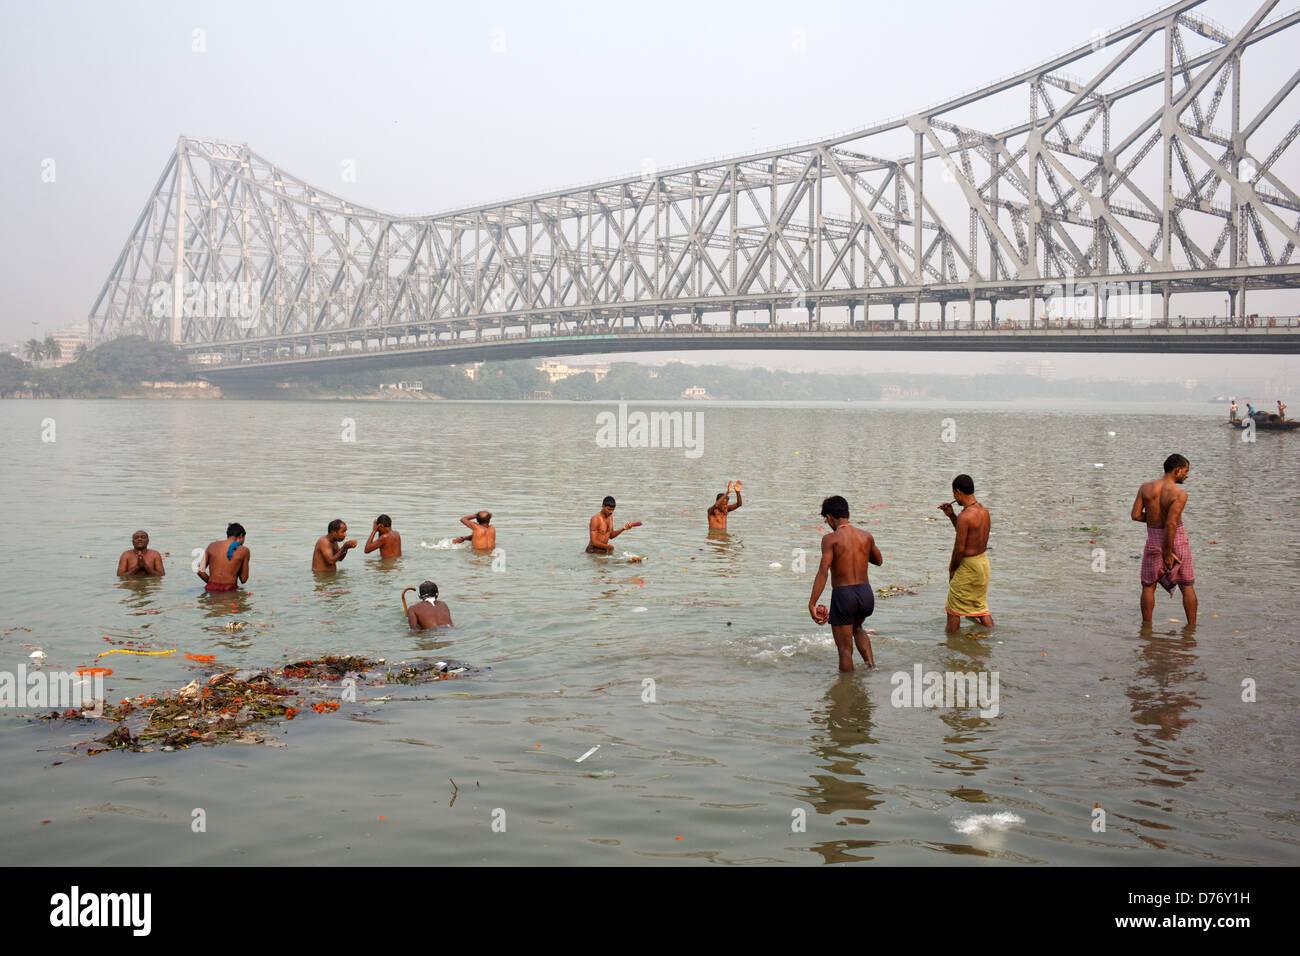 People take morning bath in Hooghly River near Howrah Bridge (Rabindra Setu) in Kolkata, India. - Stock Image